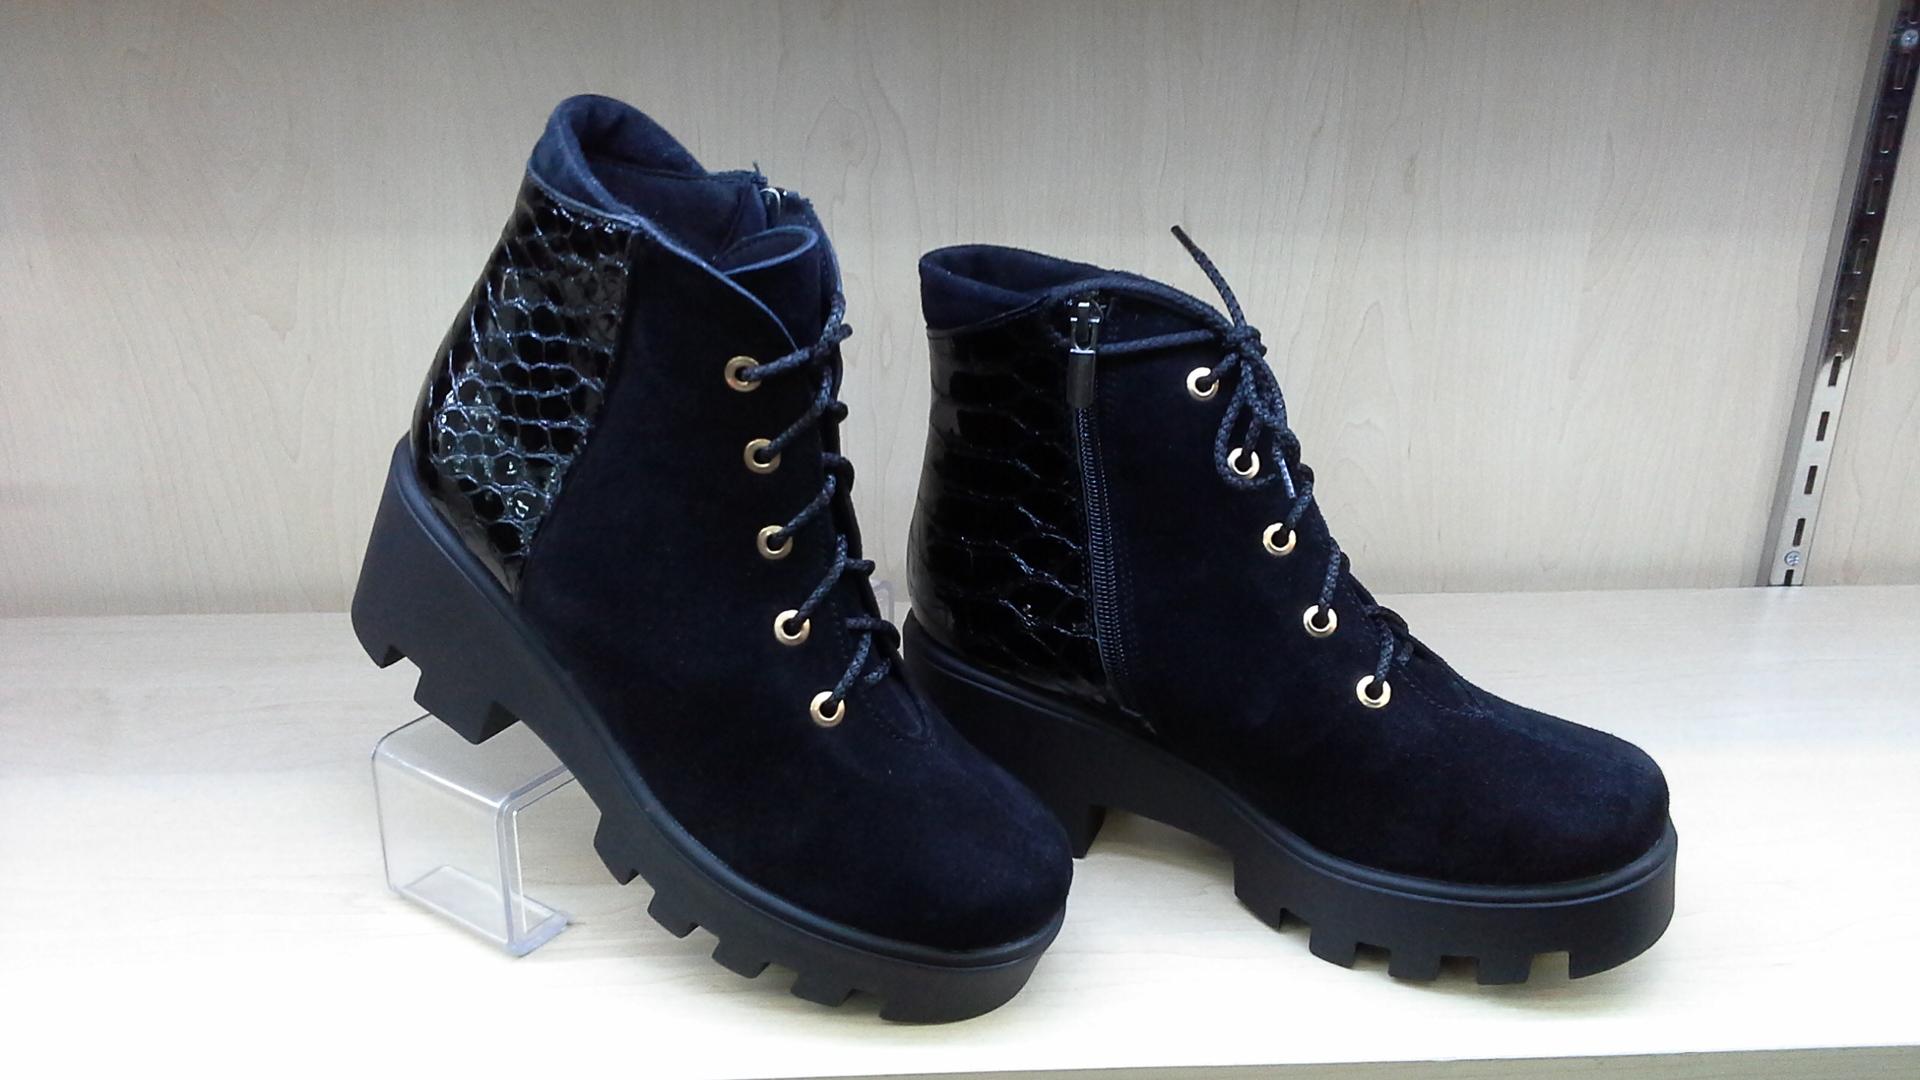 novinki-modnoj-zimnej-zhenskoj-obuvi-31